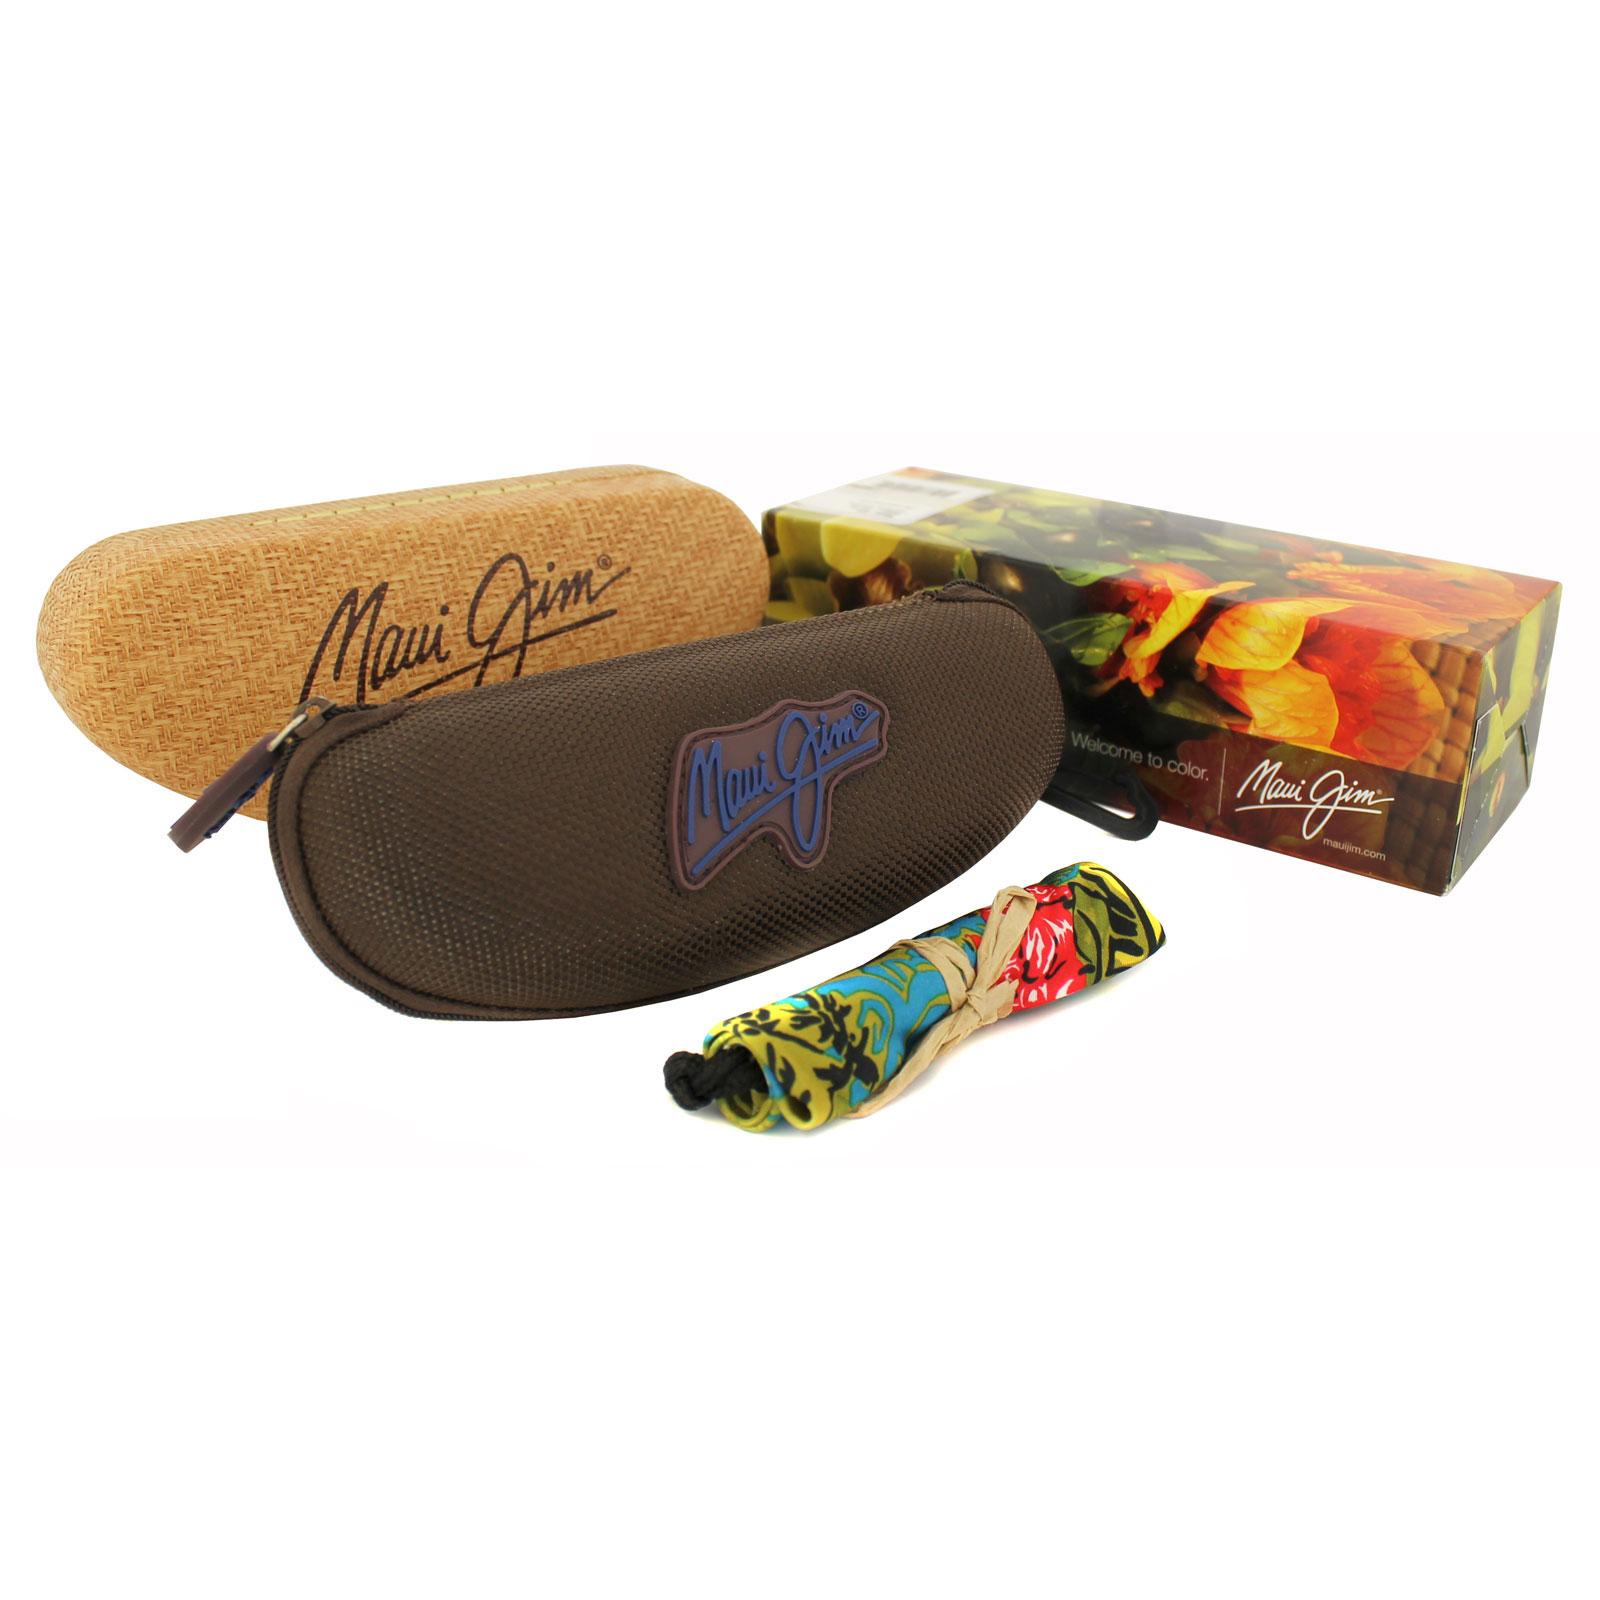 Maui Jim Sunglasses Ebay  maui jim sunglasses baby beach hs245 16 gold bronze polarized ebay